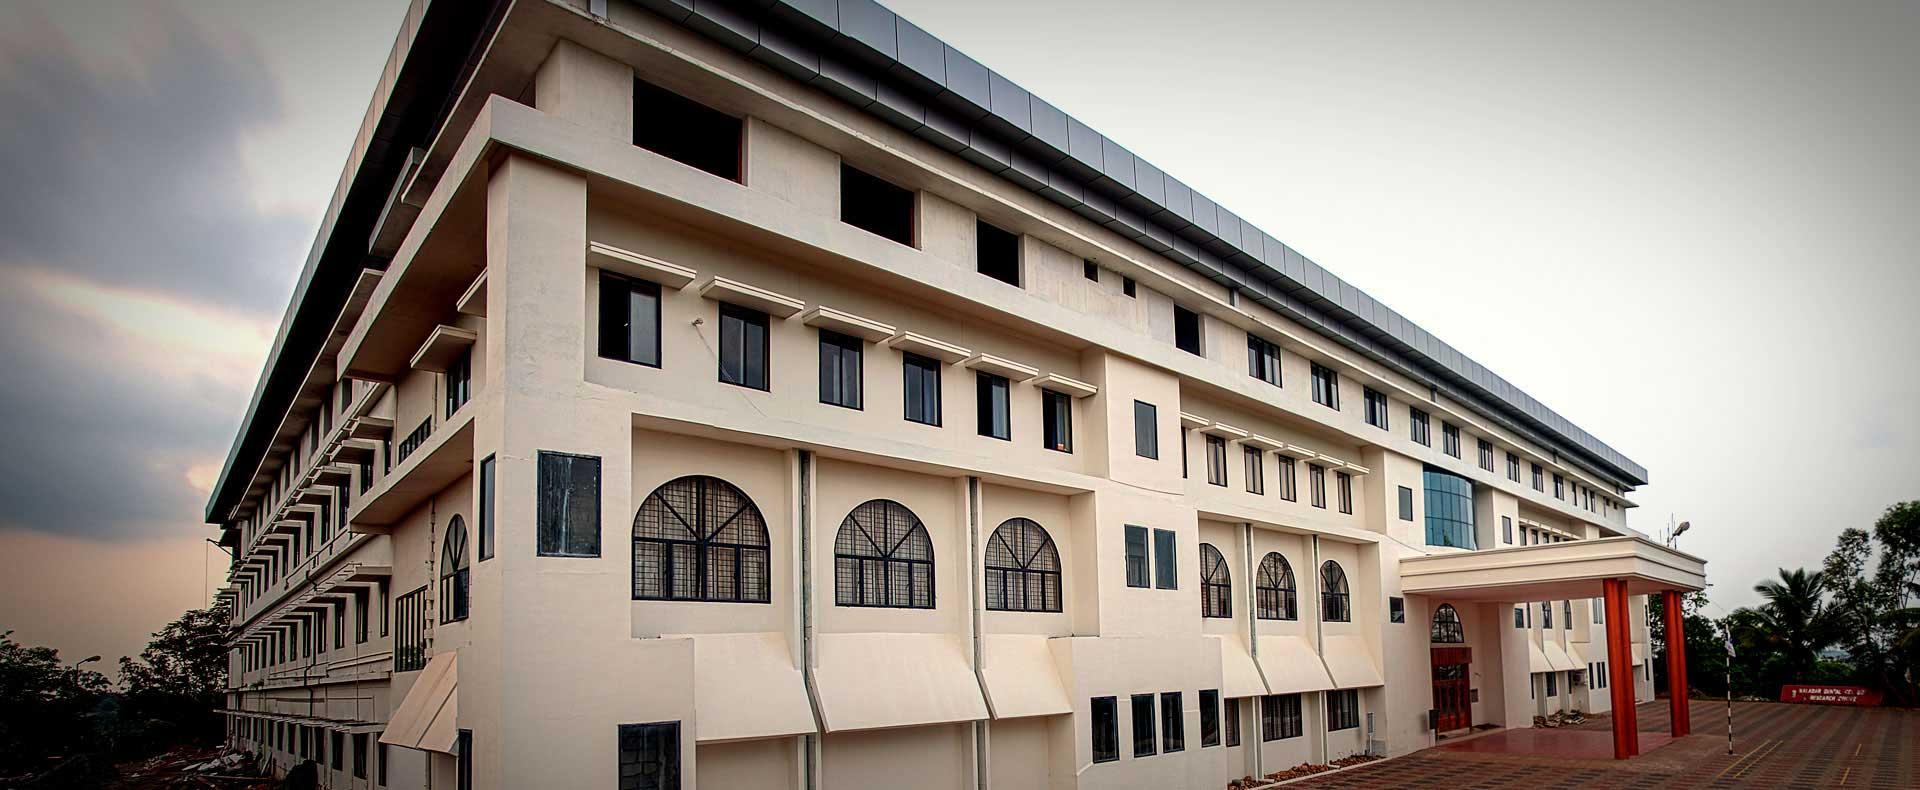 Malabar Dental College and Research Centre, Malappuram Image